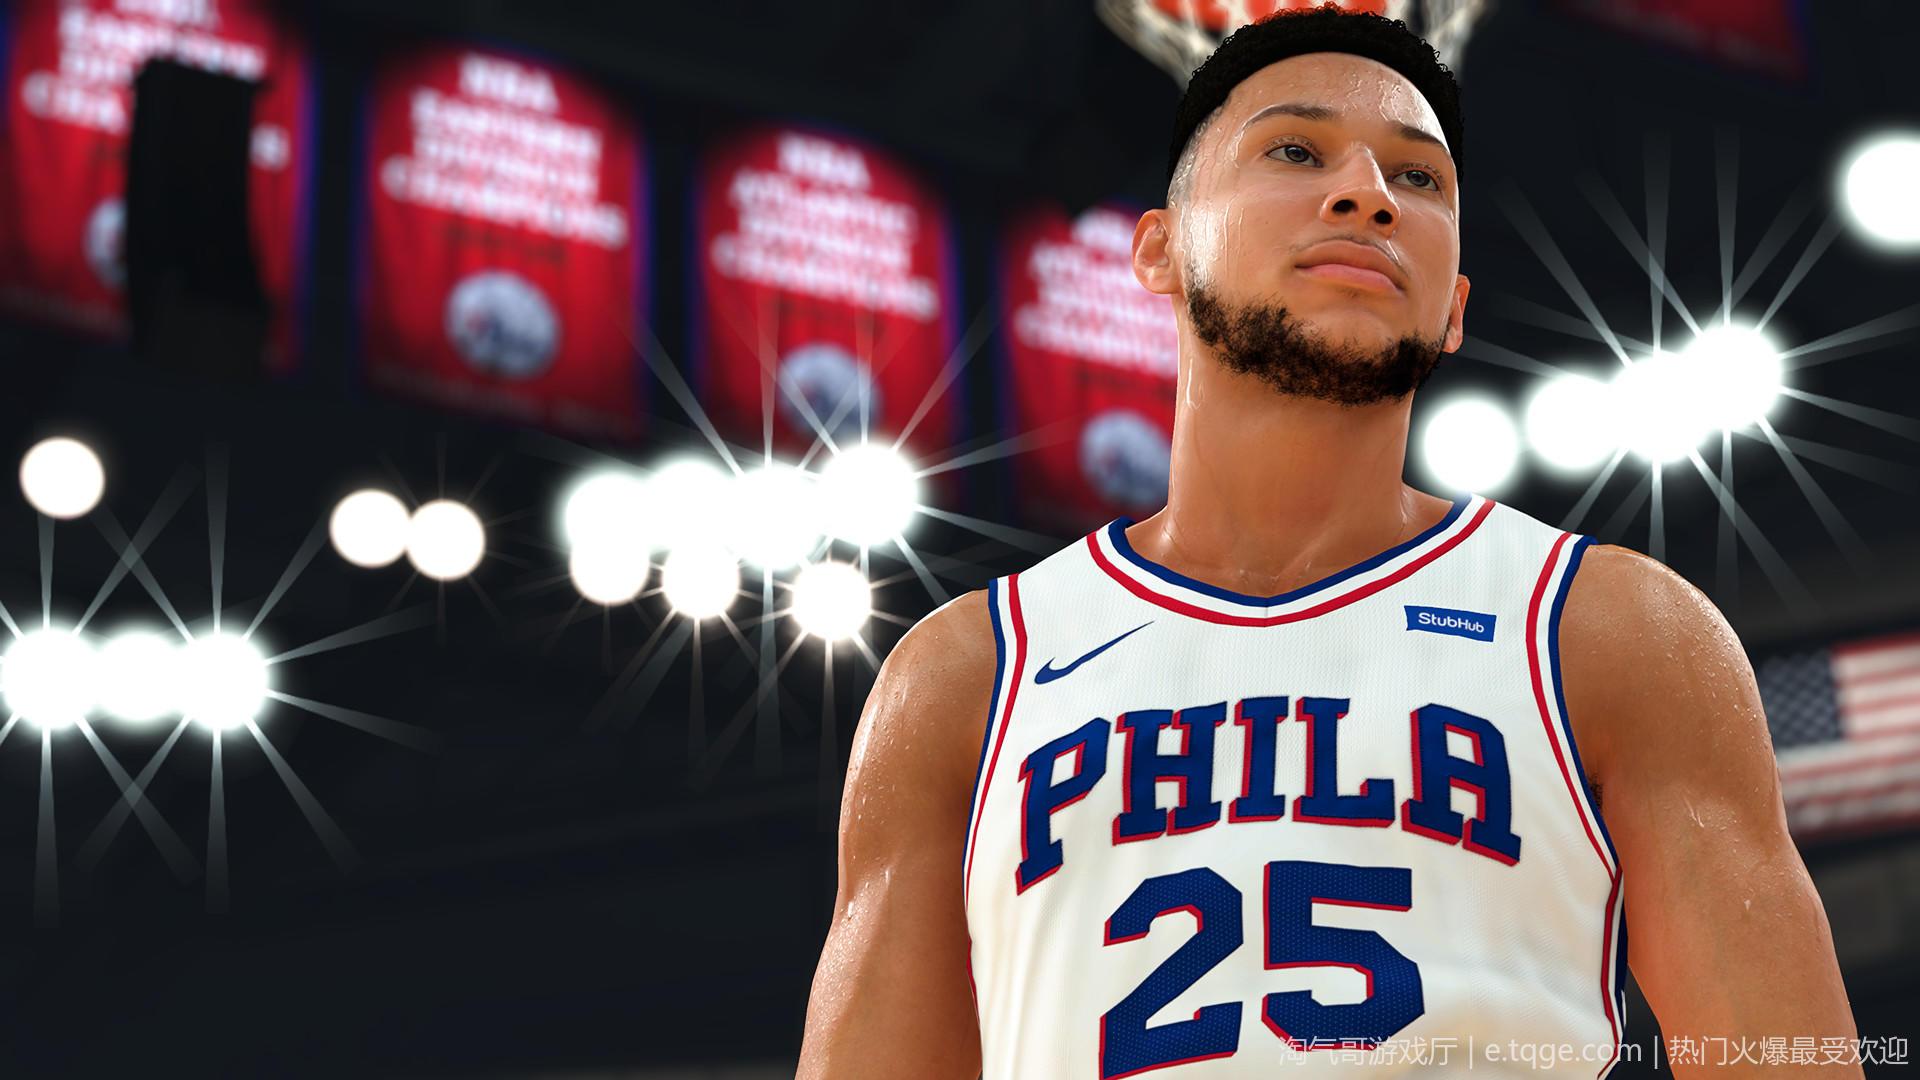 NBA 2K19【赠/18/17/16/15/14/13】 热门游戏 第3张